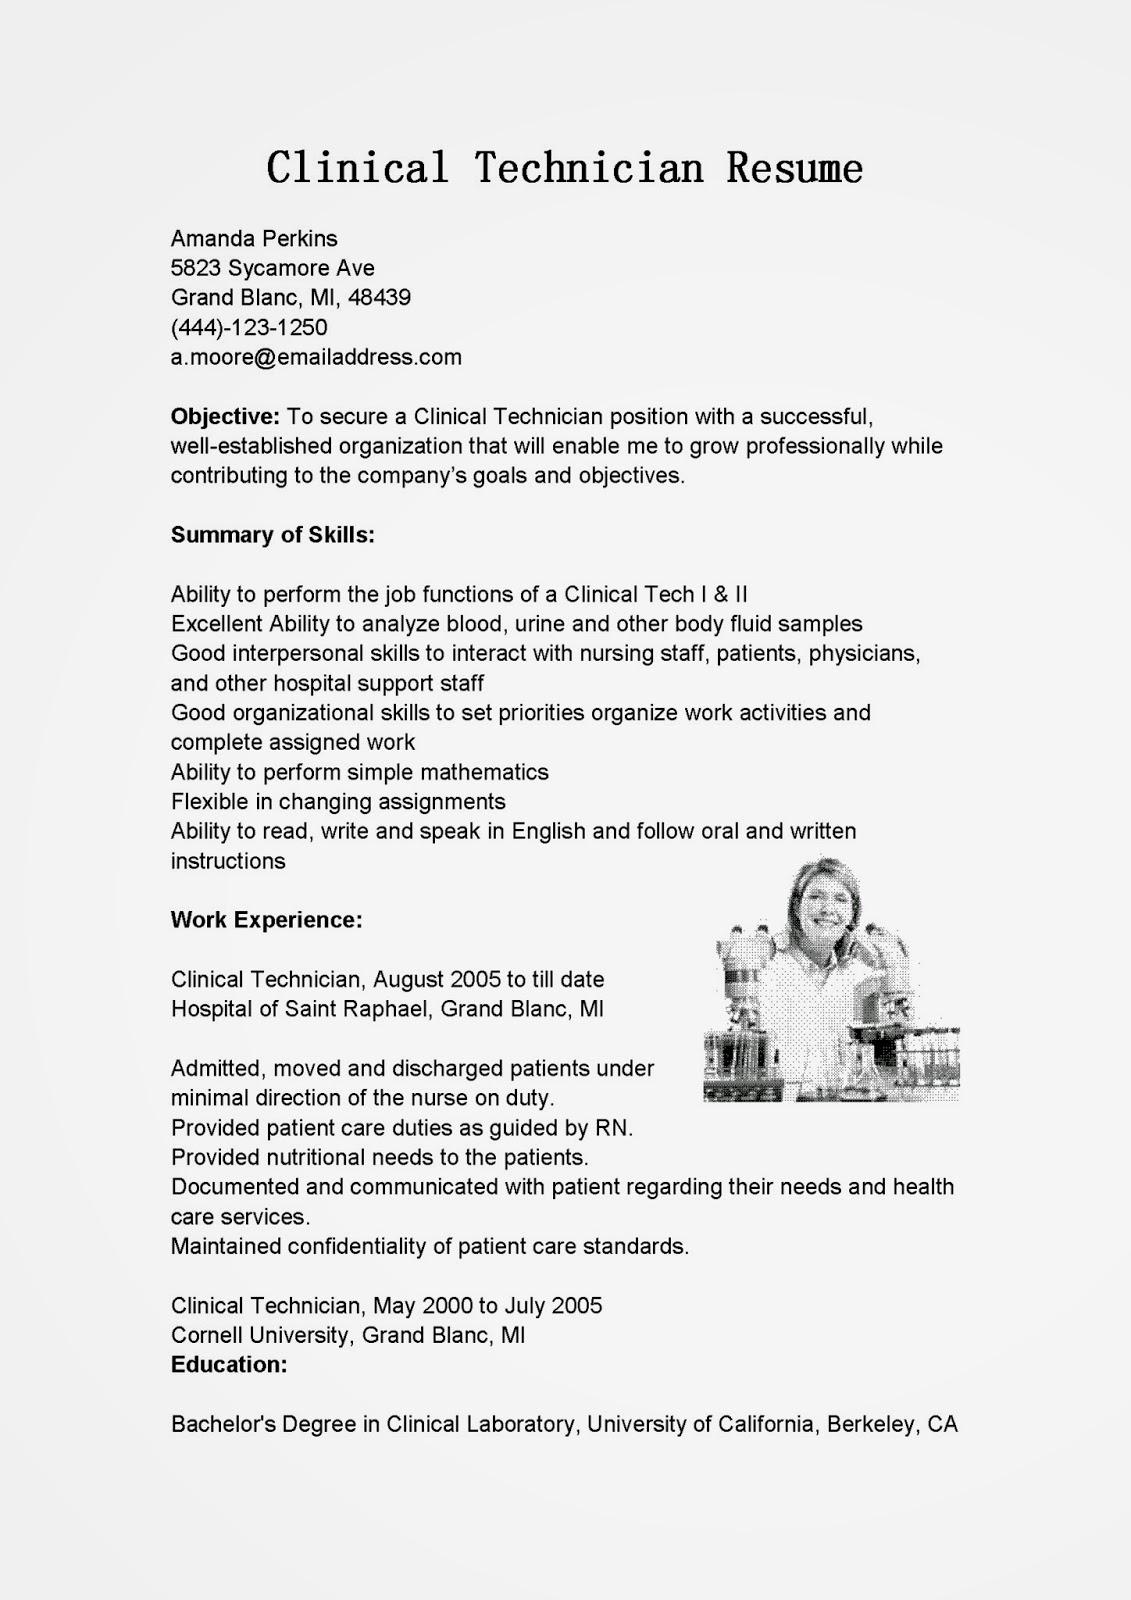 Sample Resume For Radiologic Technologist Best Resume Example  Ultrasound Tech Resume